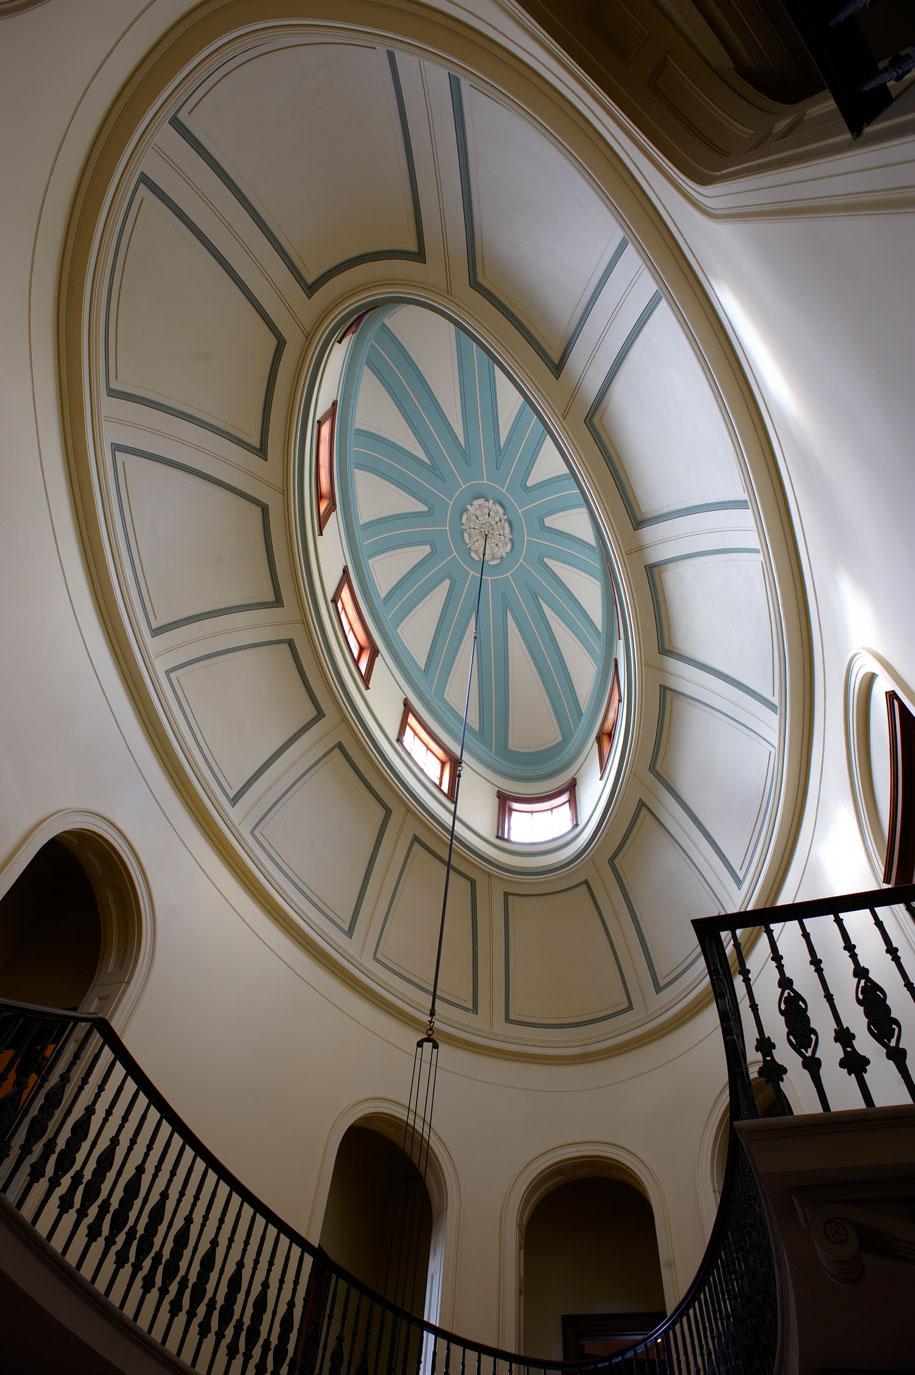 EBH13_0006-Nicholas-Watt-Sydney-Living-Museums-dome-in-the-saloon